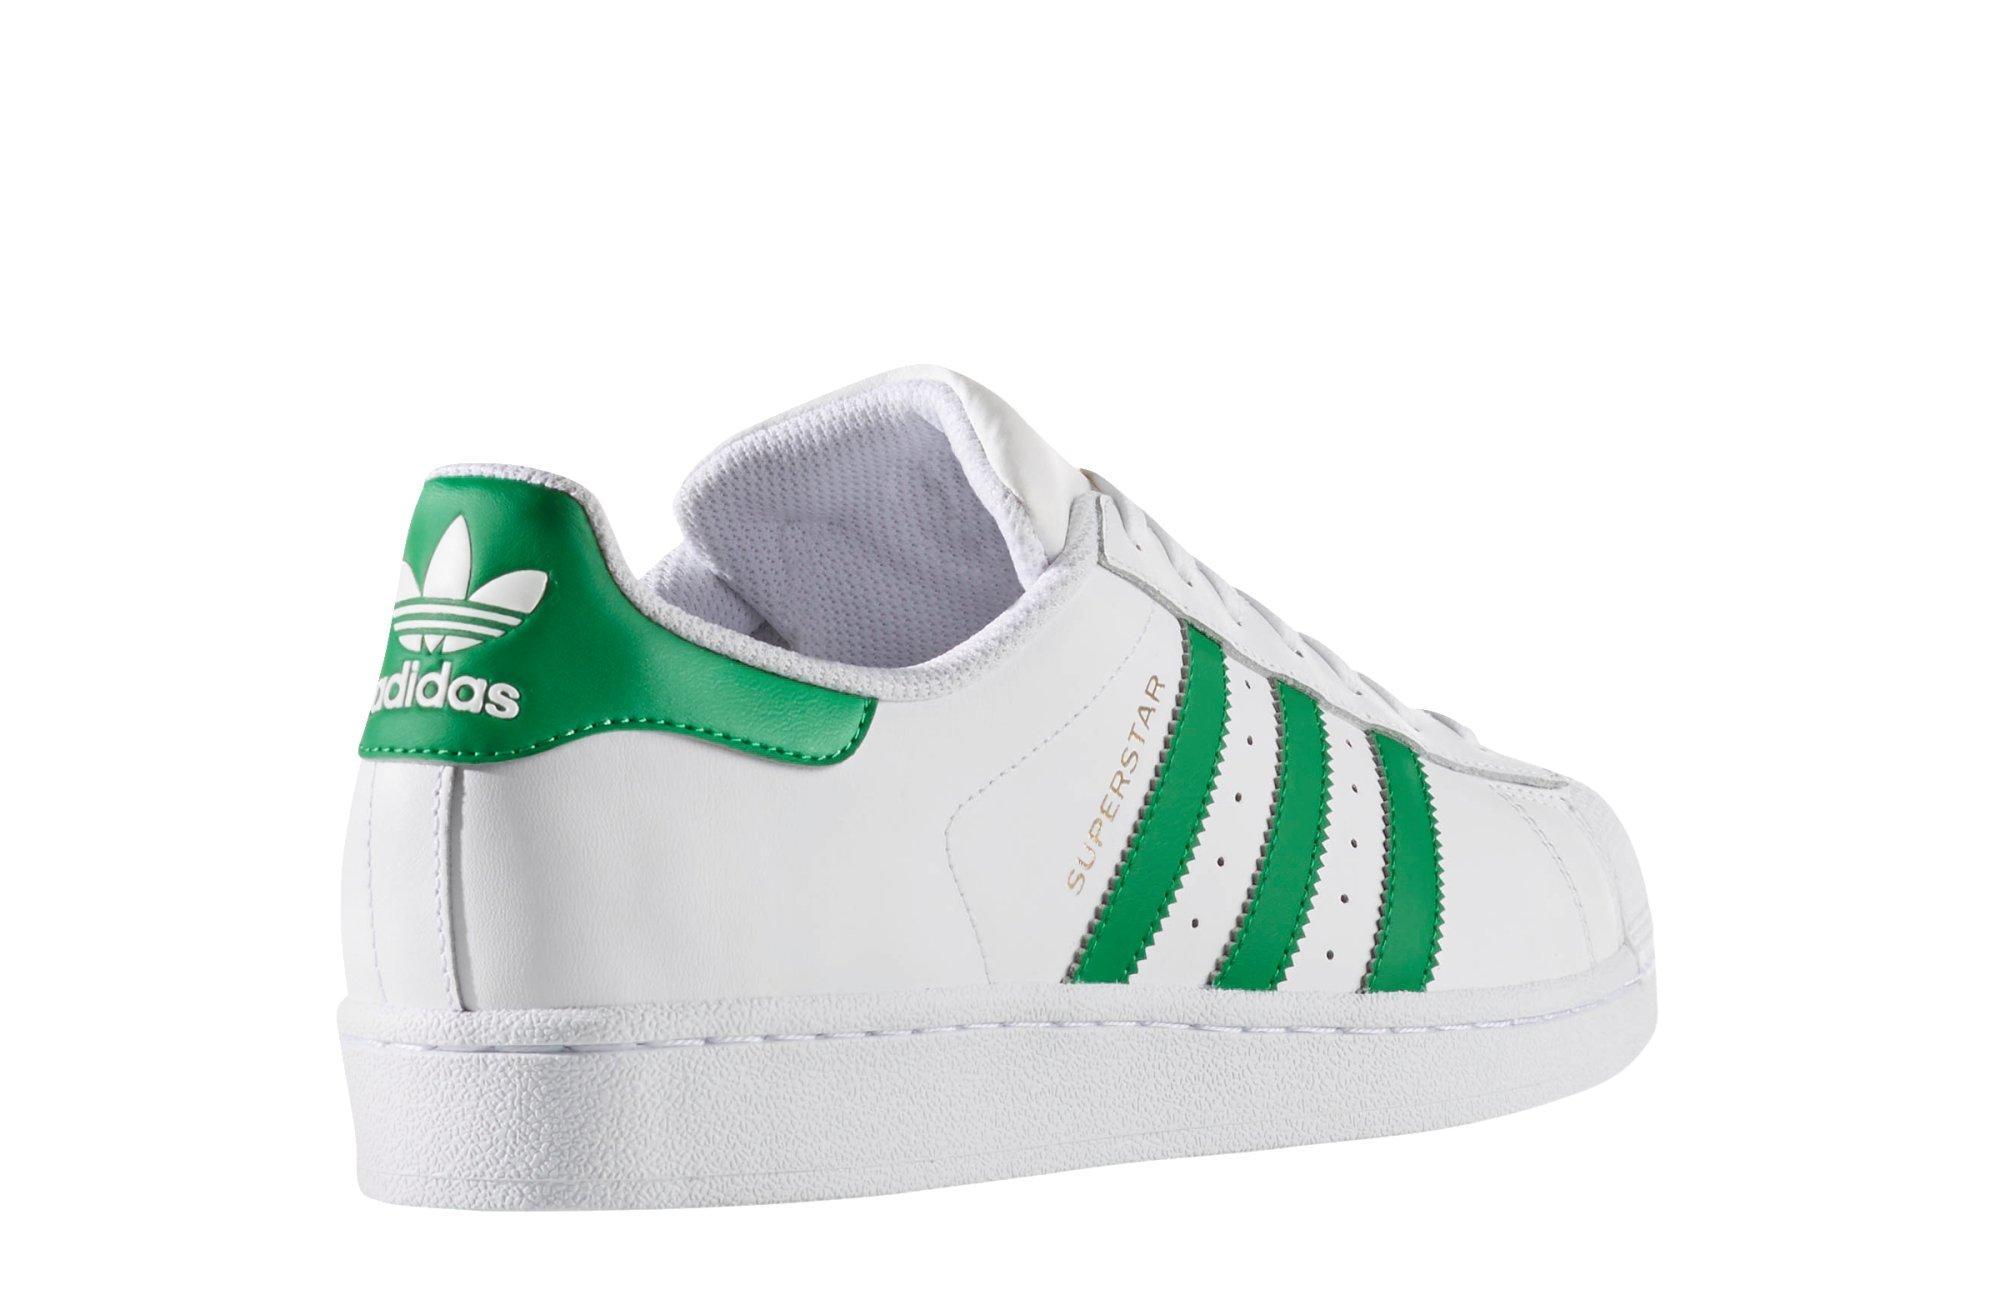 adidas superstar green shoes